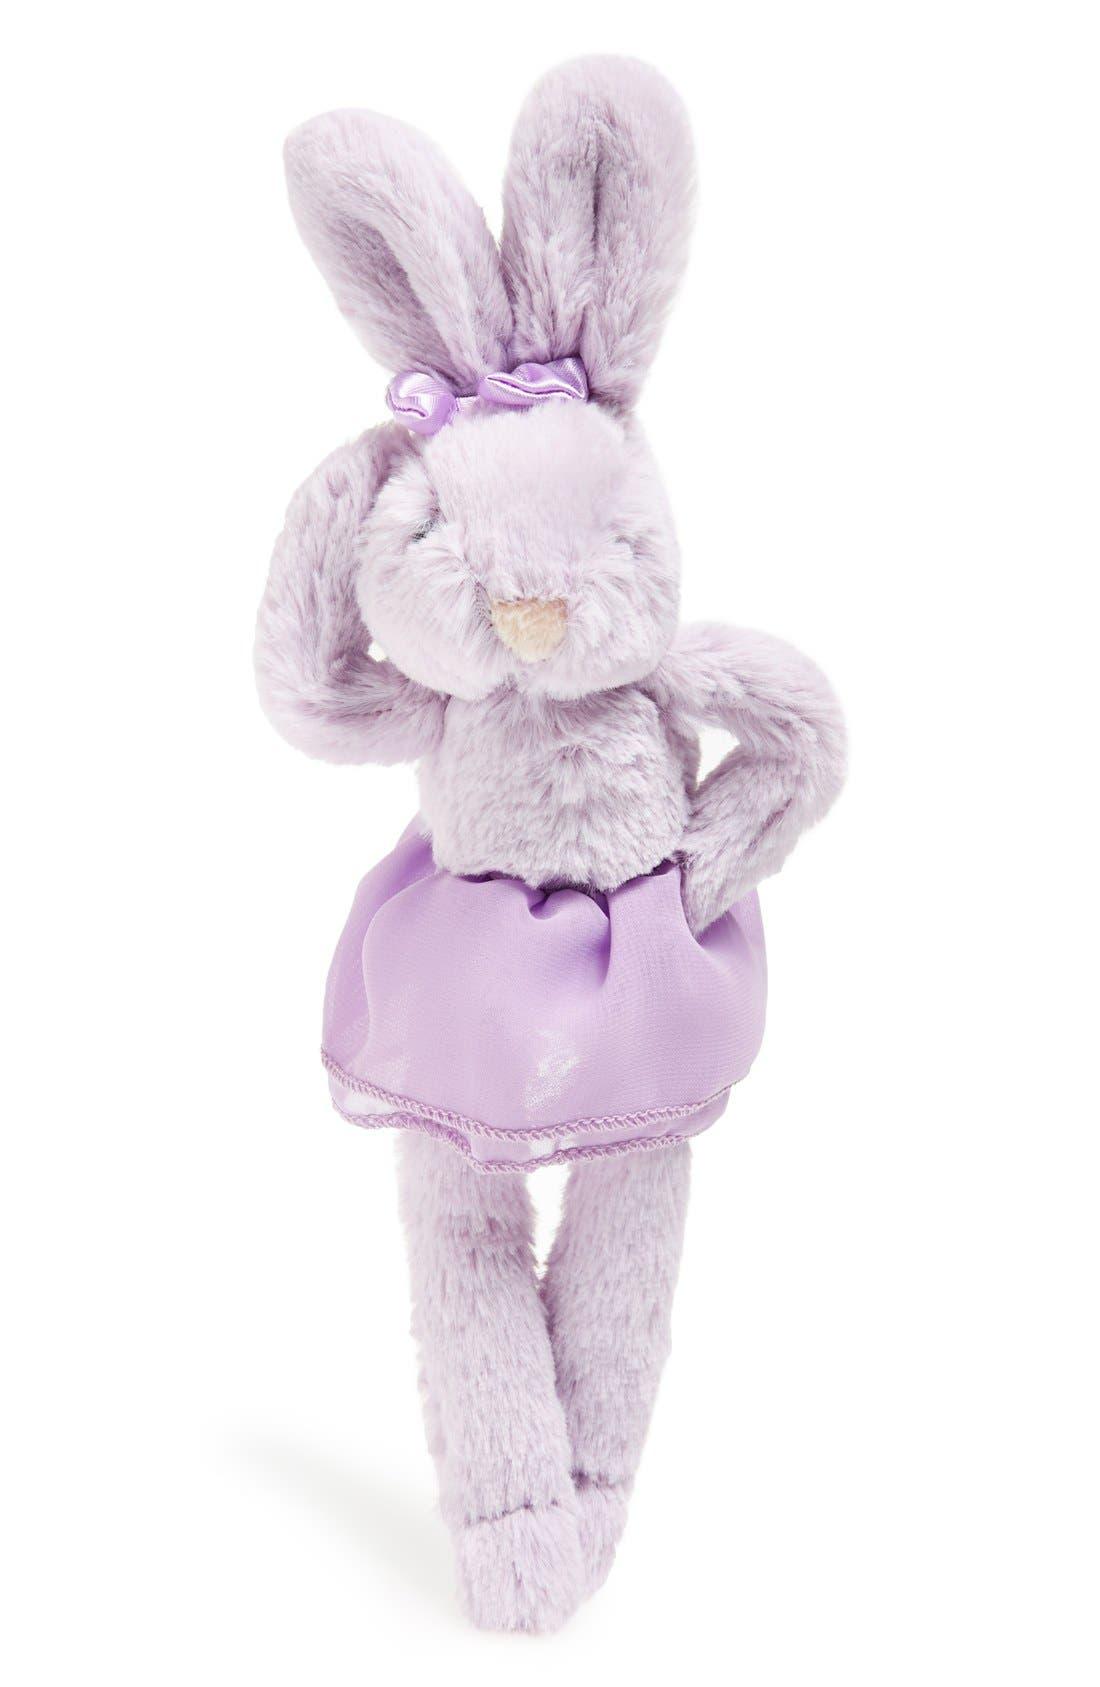 Jellycat 'Plum Bunny' Stuffed Animal